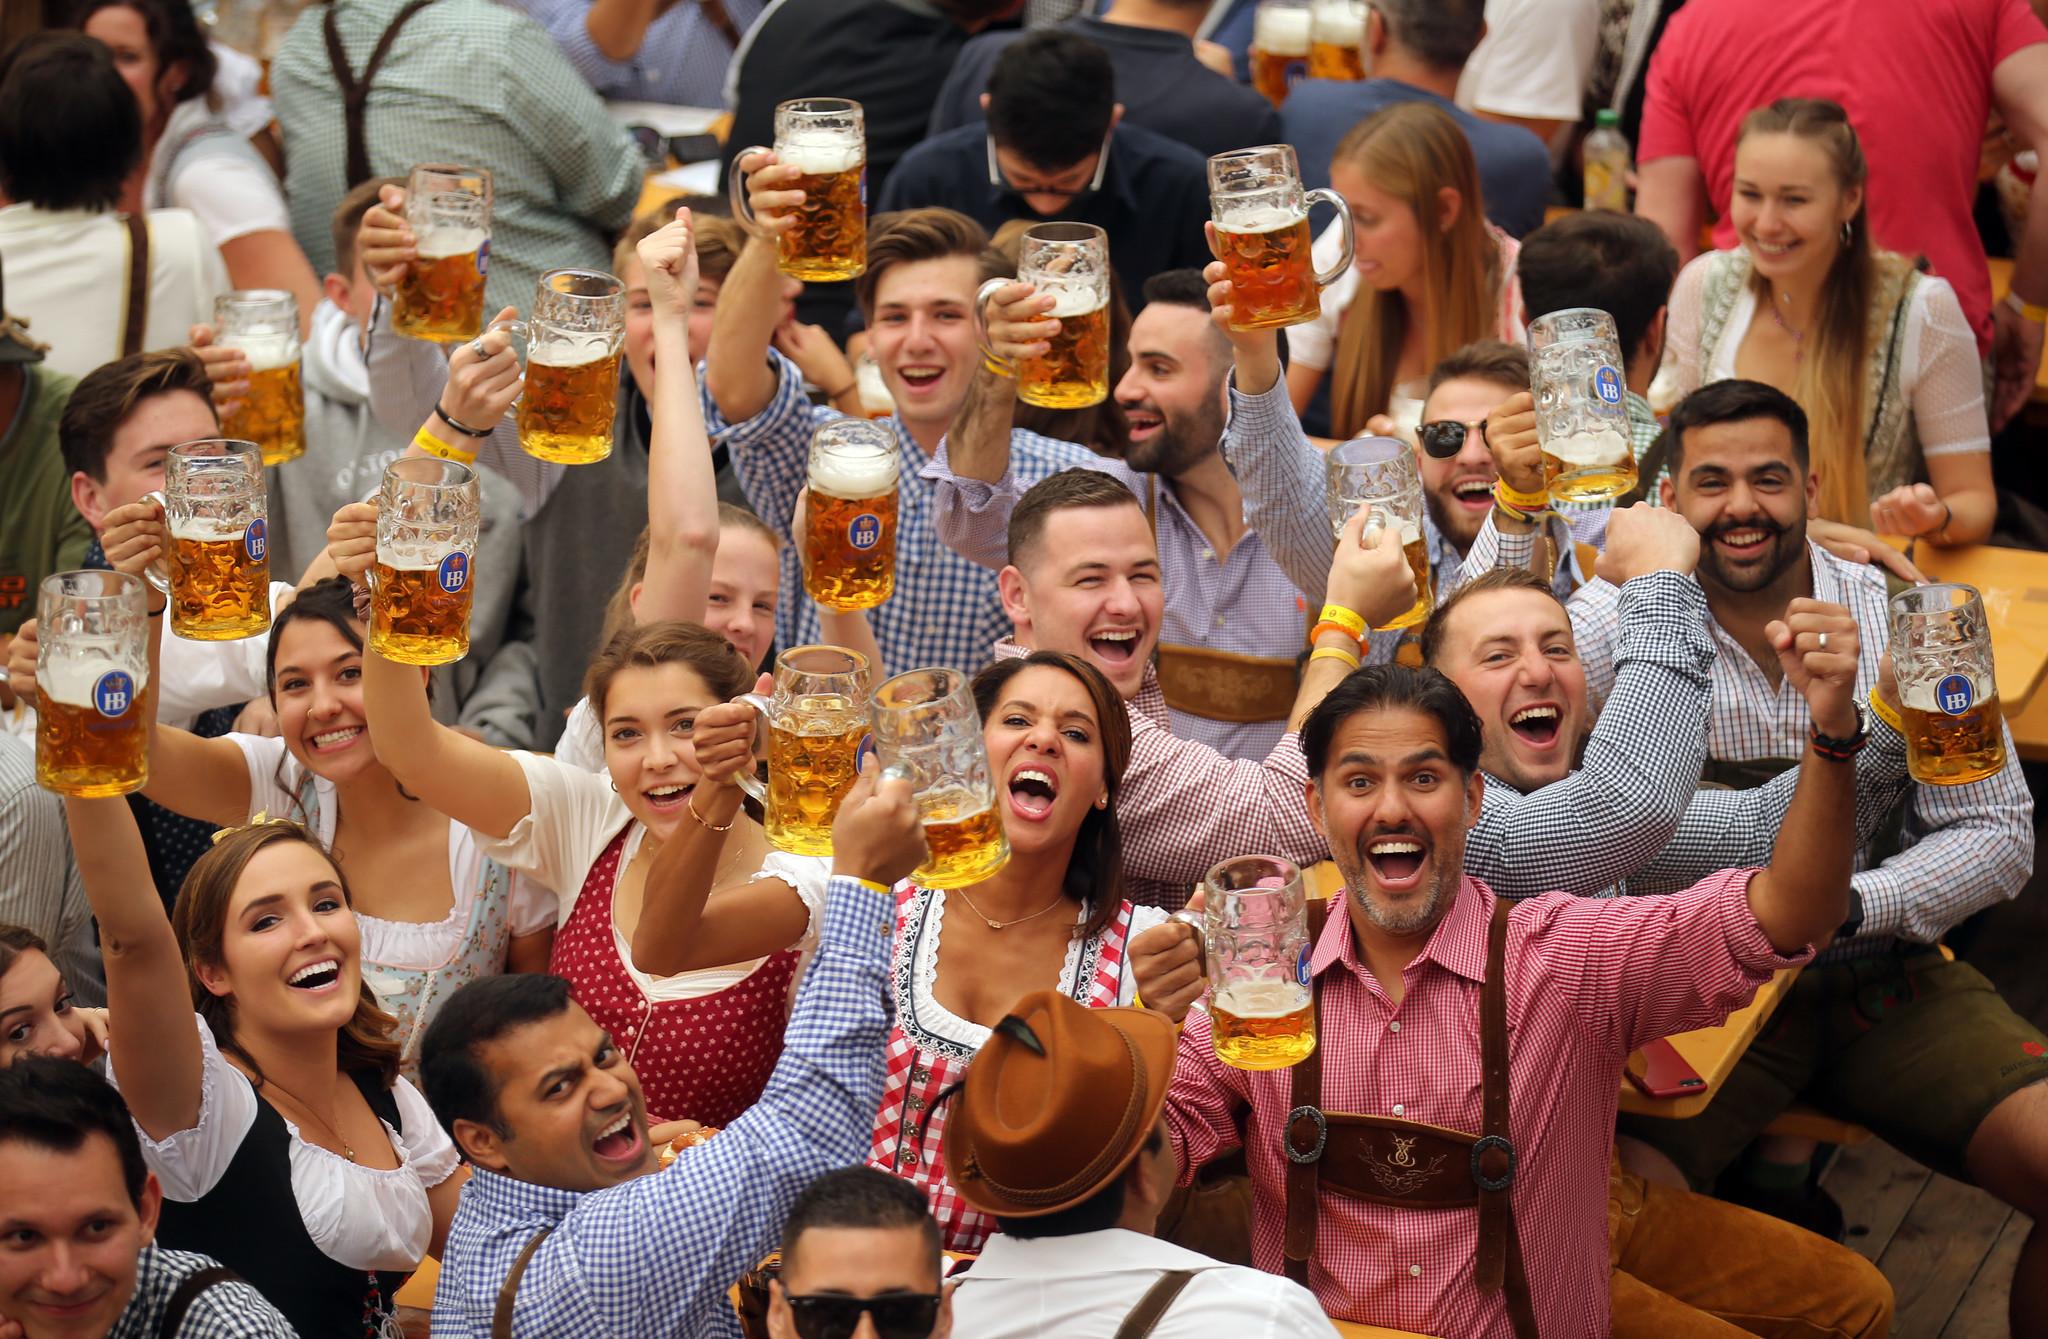 Oh, beer God! Oktoberfest has opened in Munich